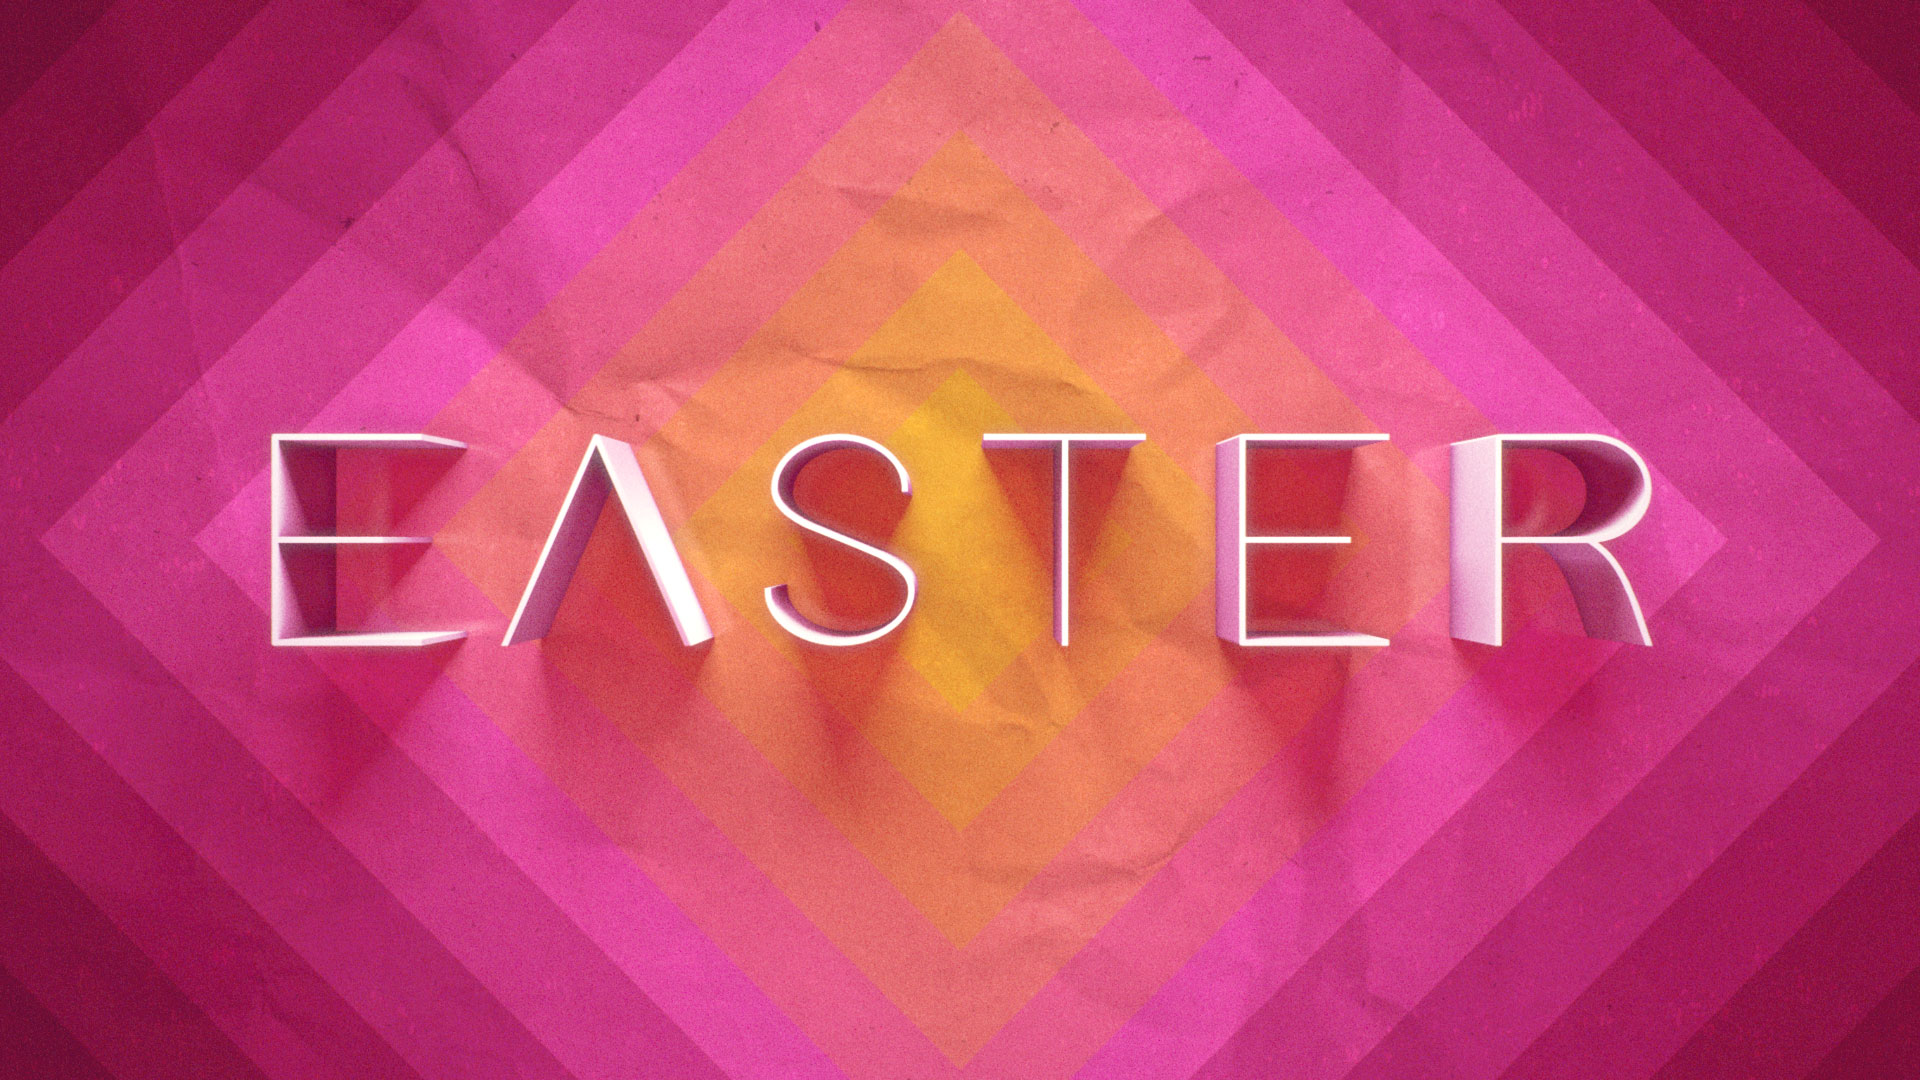 easter_2017_main_hd.jpg